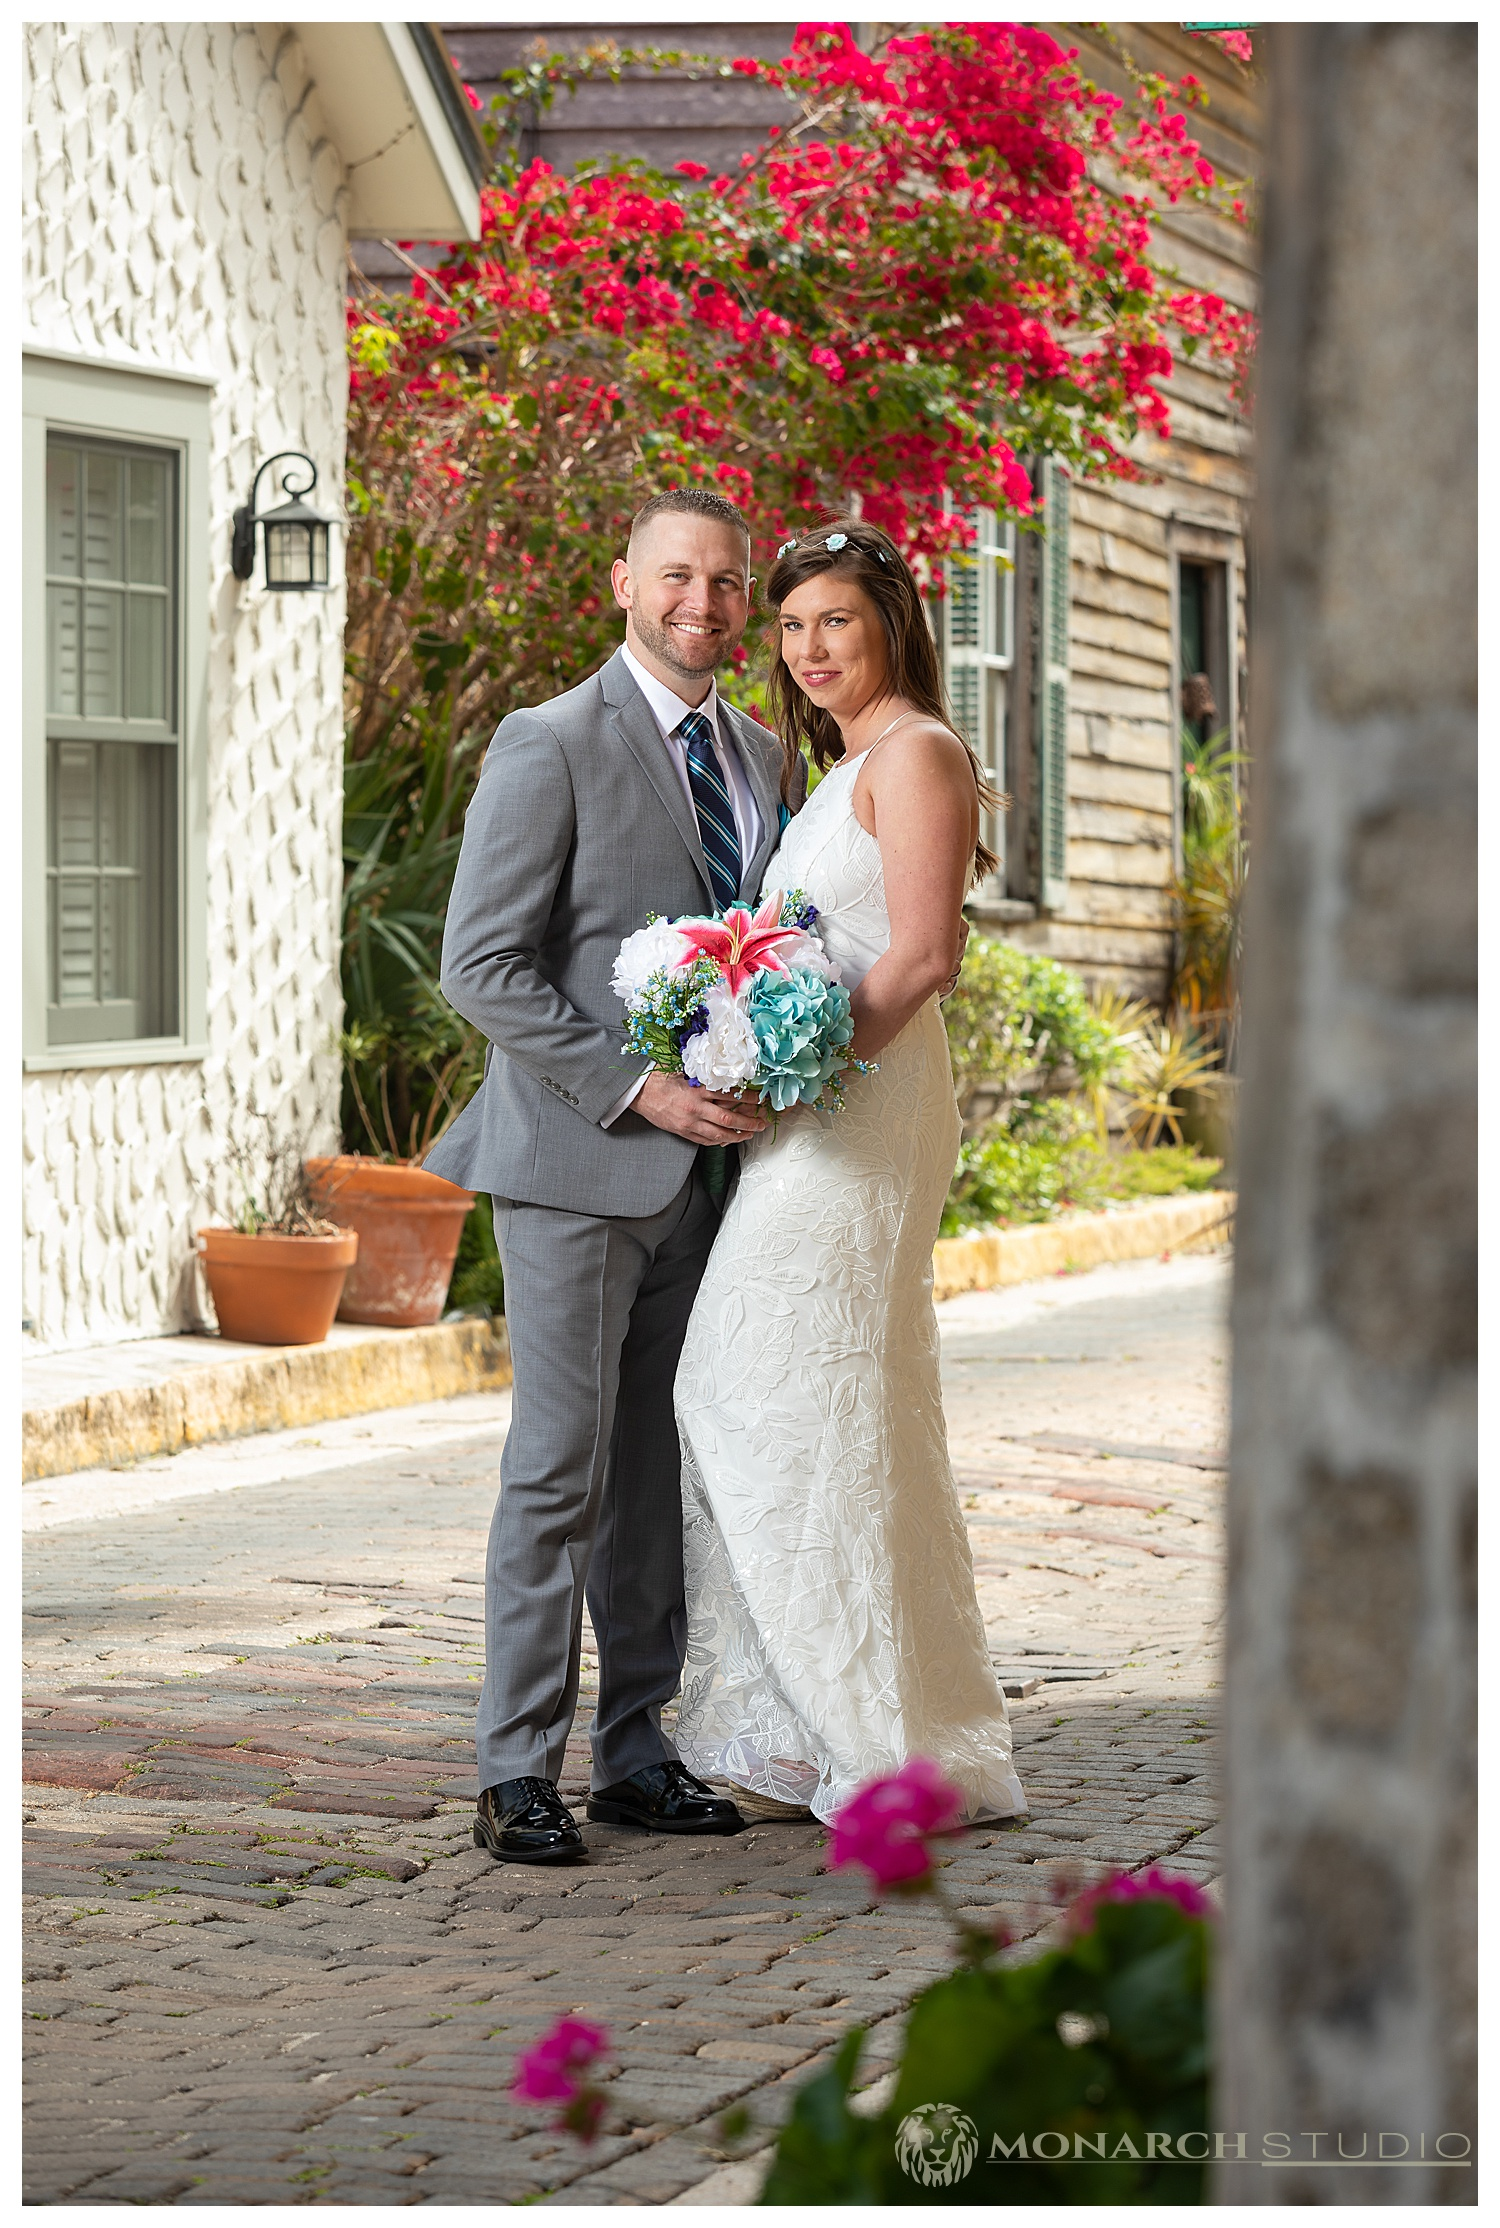 St. Augustine bed and breakfast wedding - 023.JPG